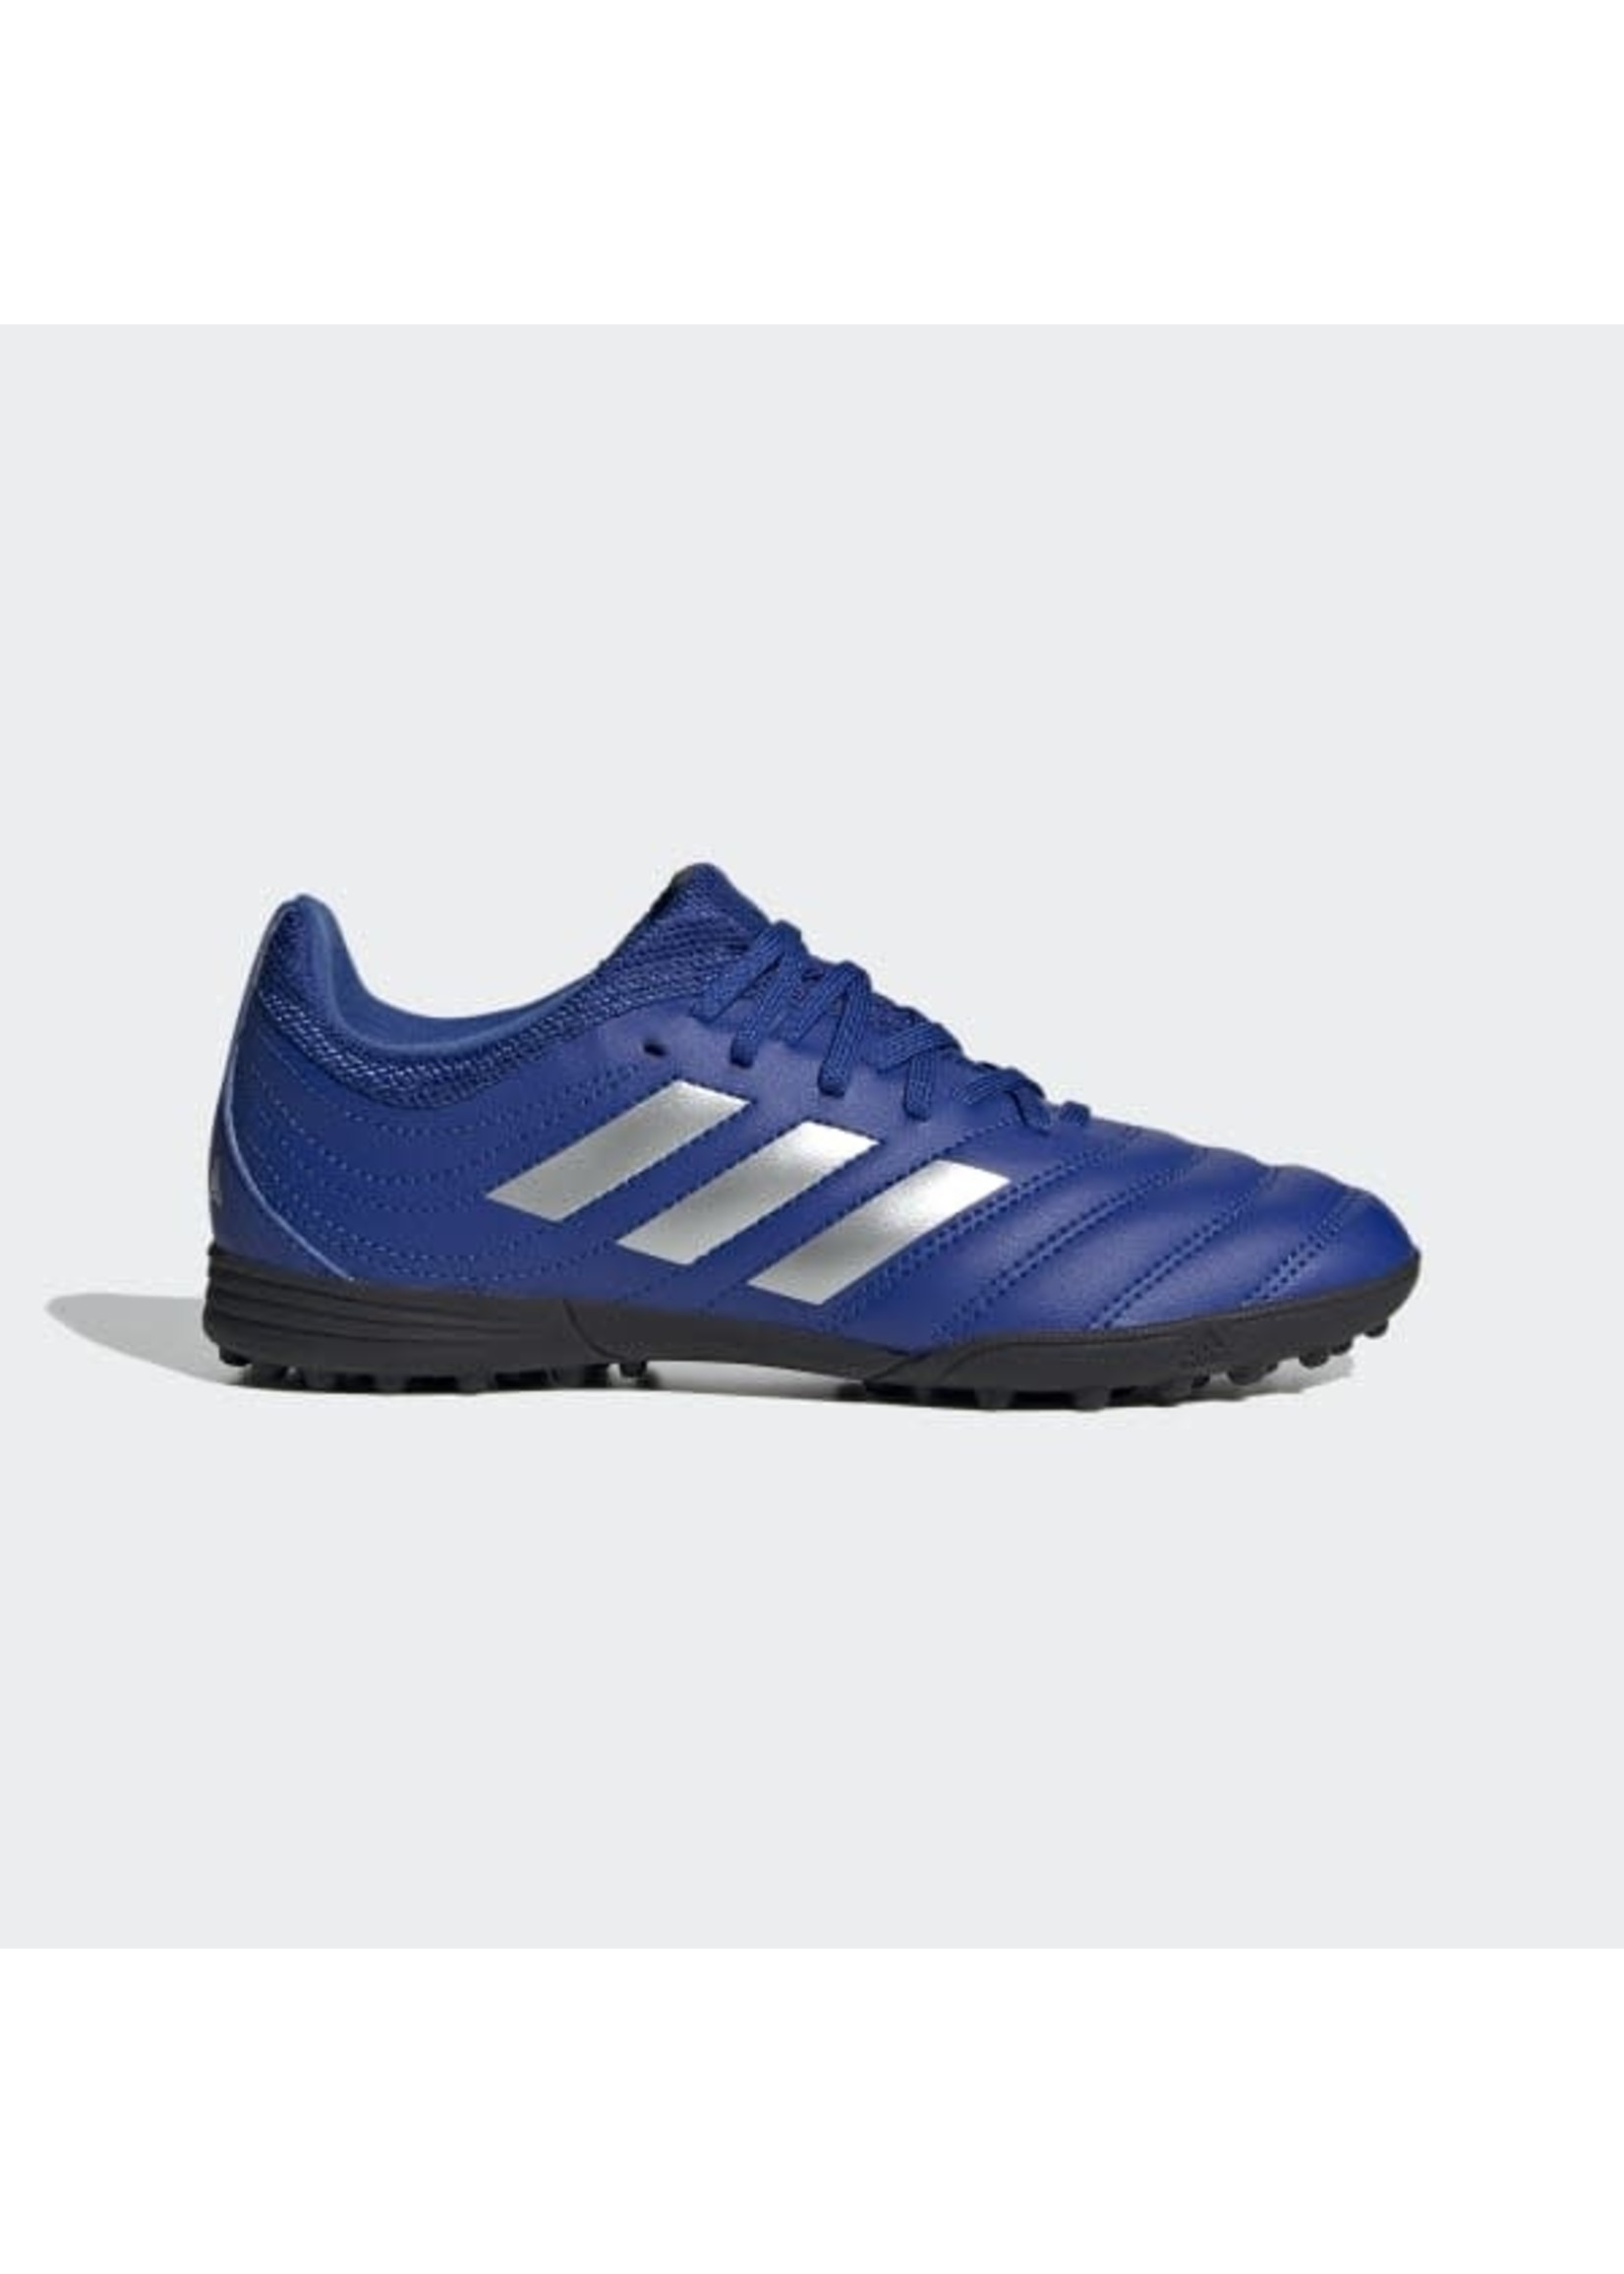 Adidas Copa 20.3 TF Jr EH0915